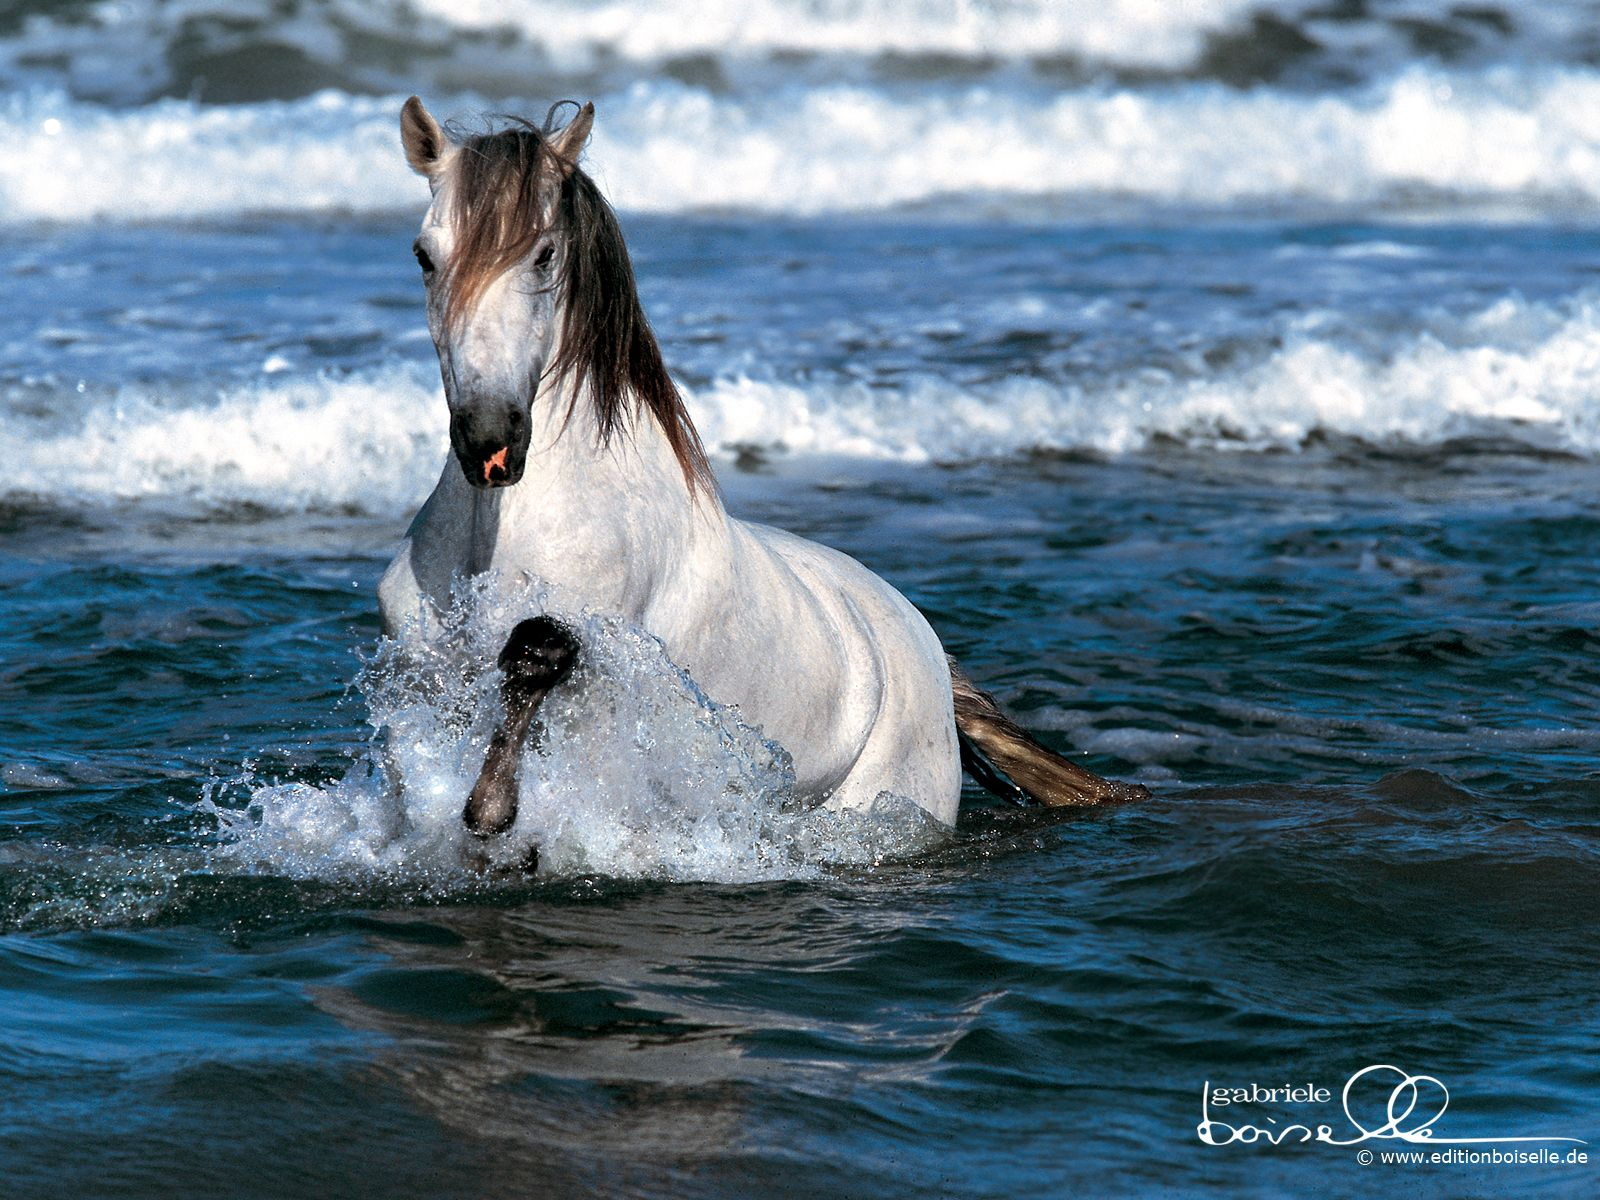 Good Wallpaper Horse Ocean - ac7192f59eb3778150c393acca46a832  You Should Have_569142.jpg